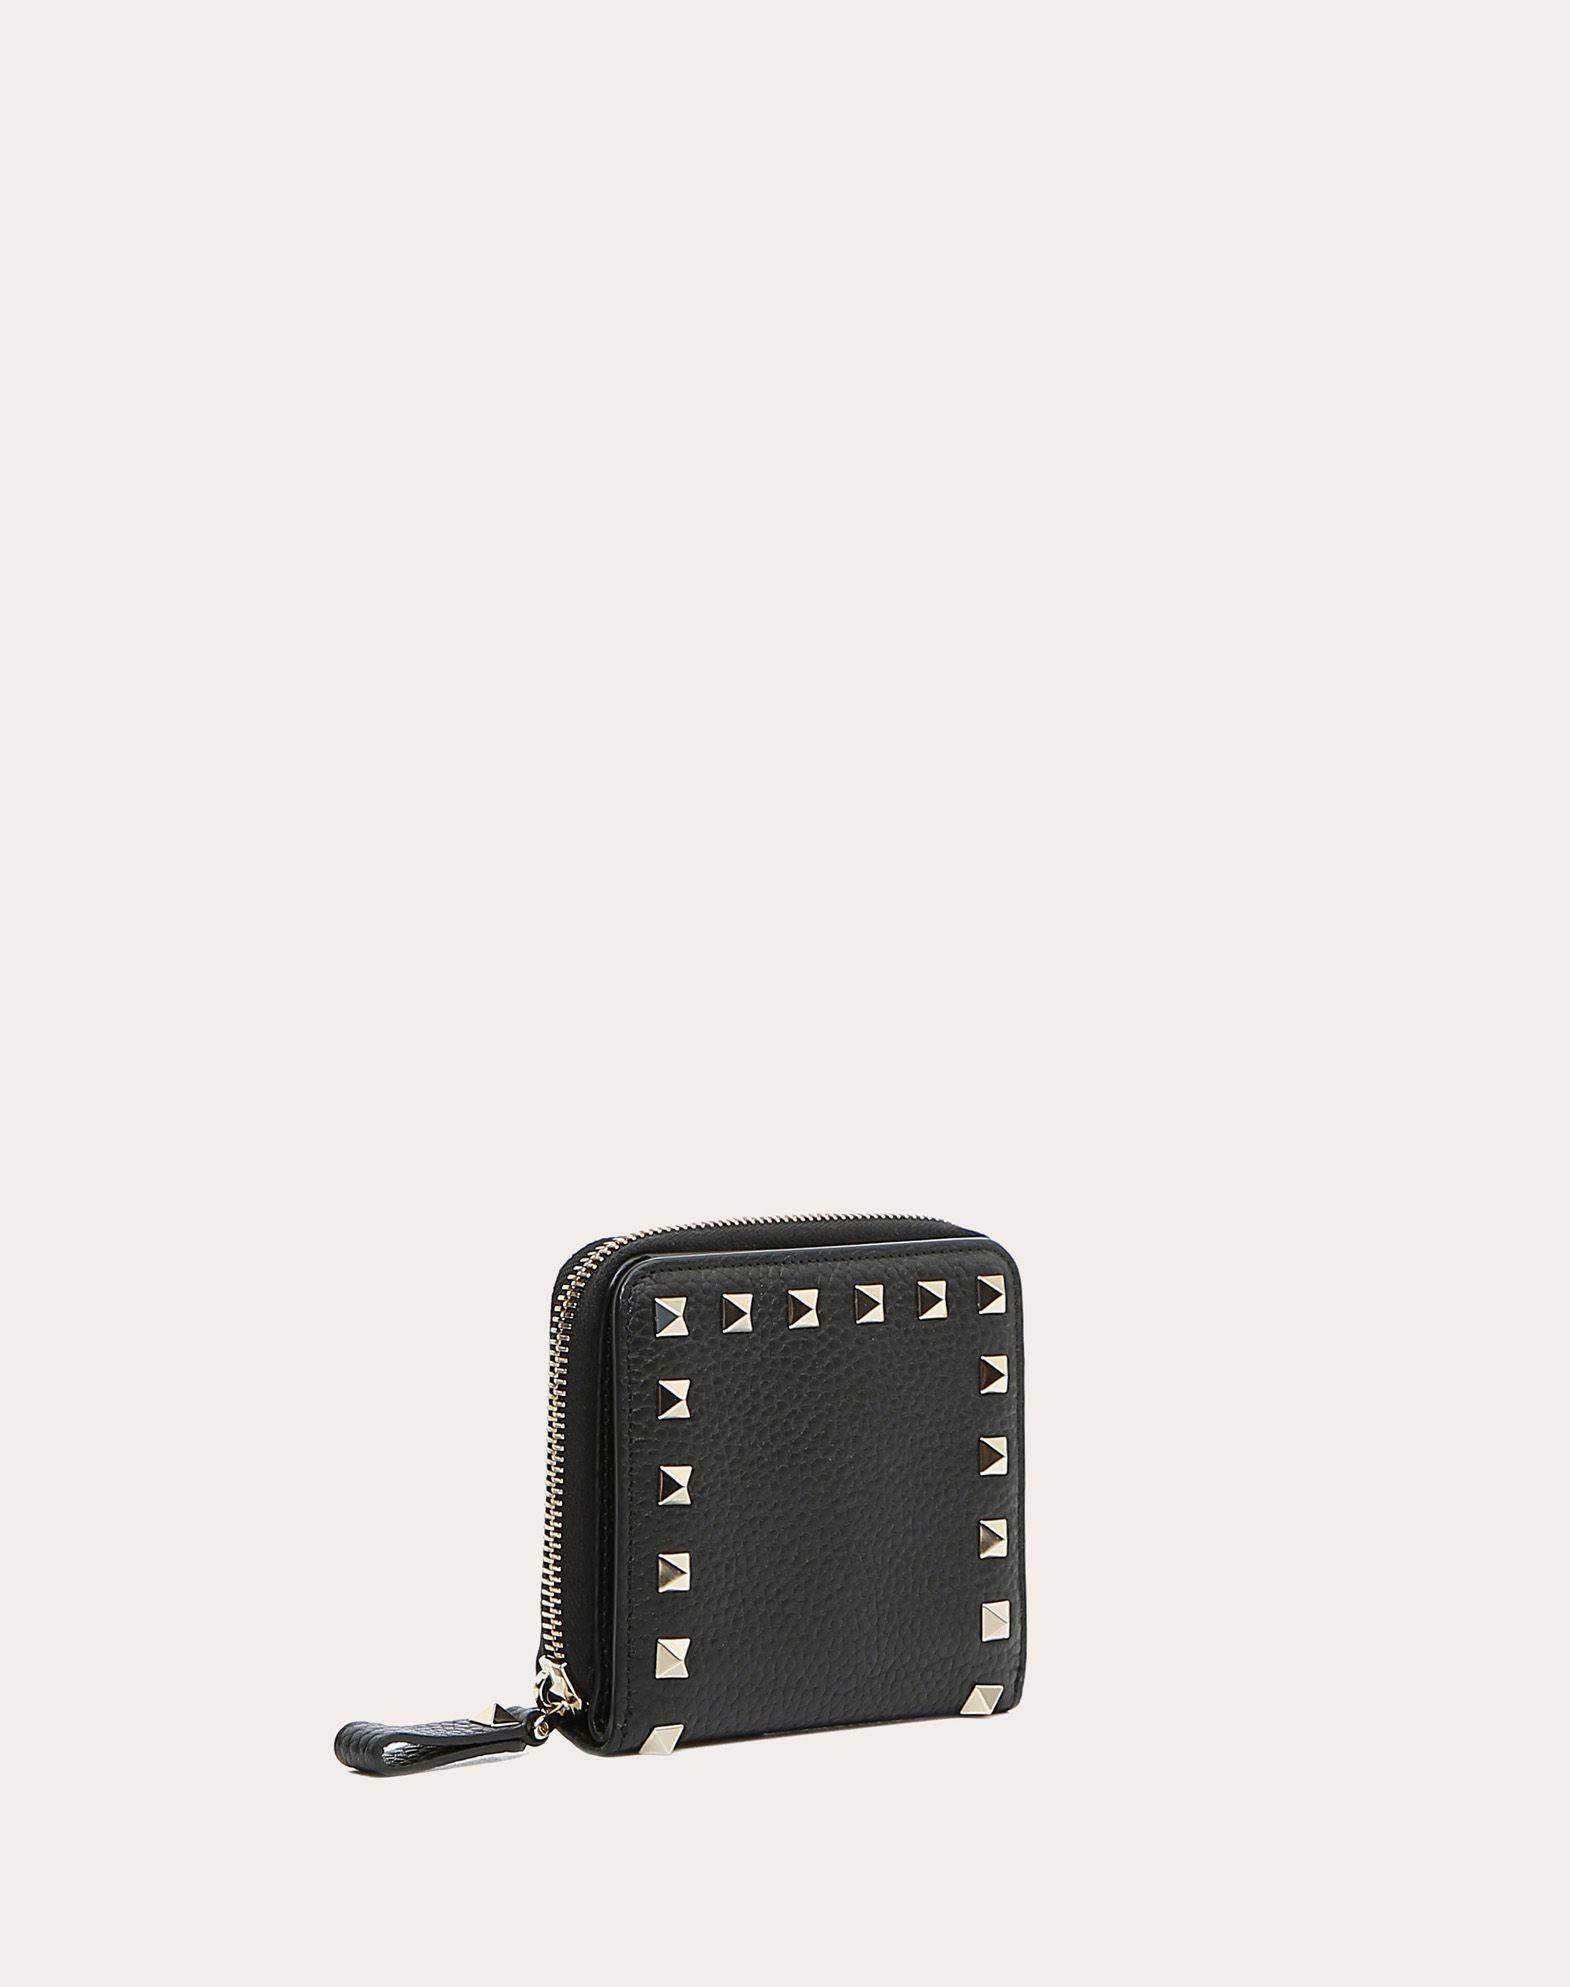 VALENTINO GARAVANI Rockstud Compact Wallet COMPACT WALLETS D r